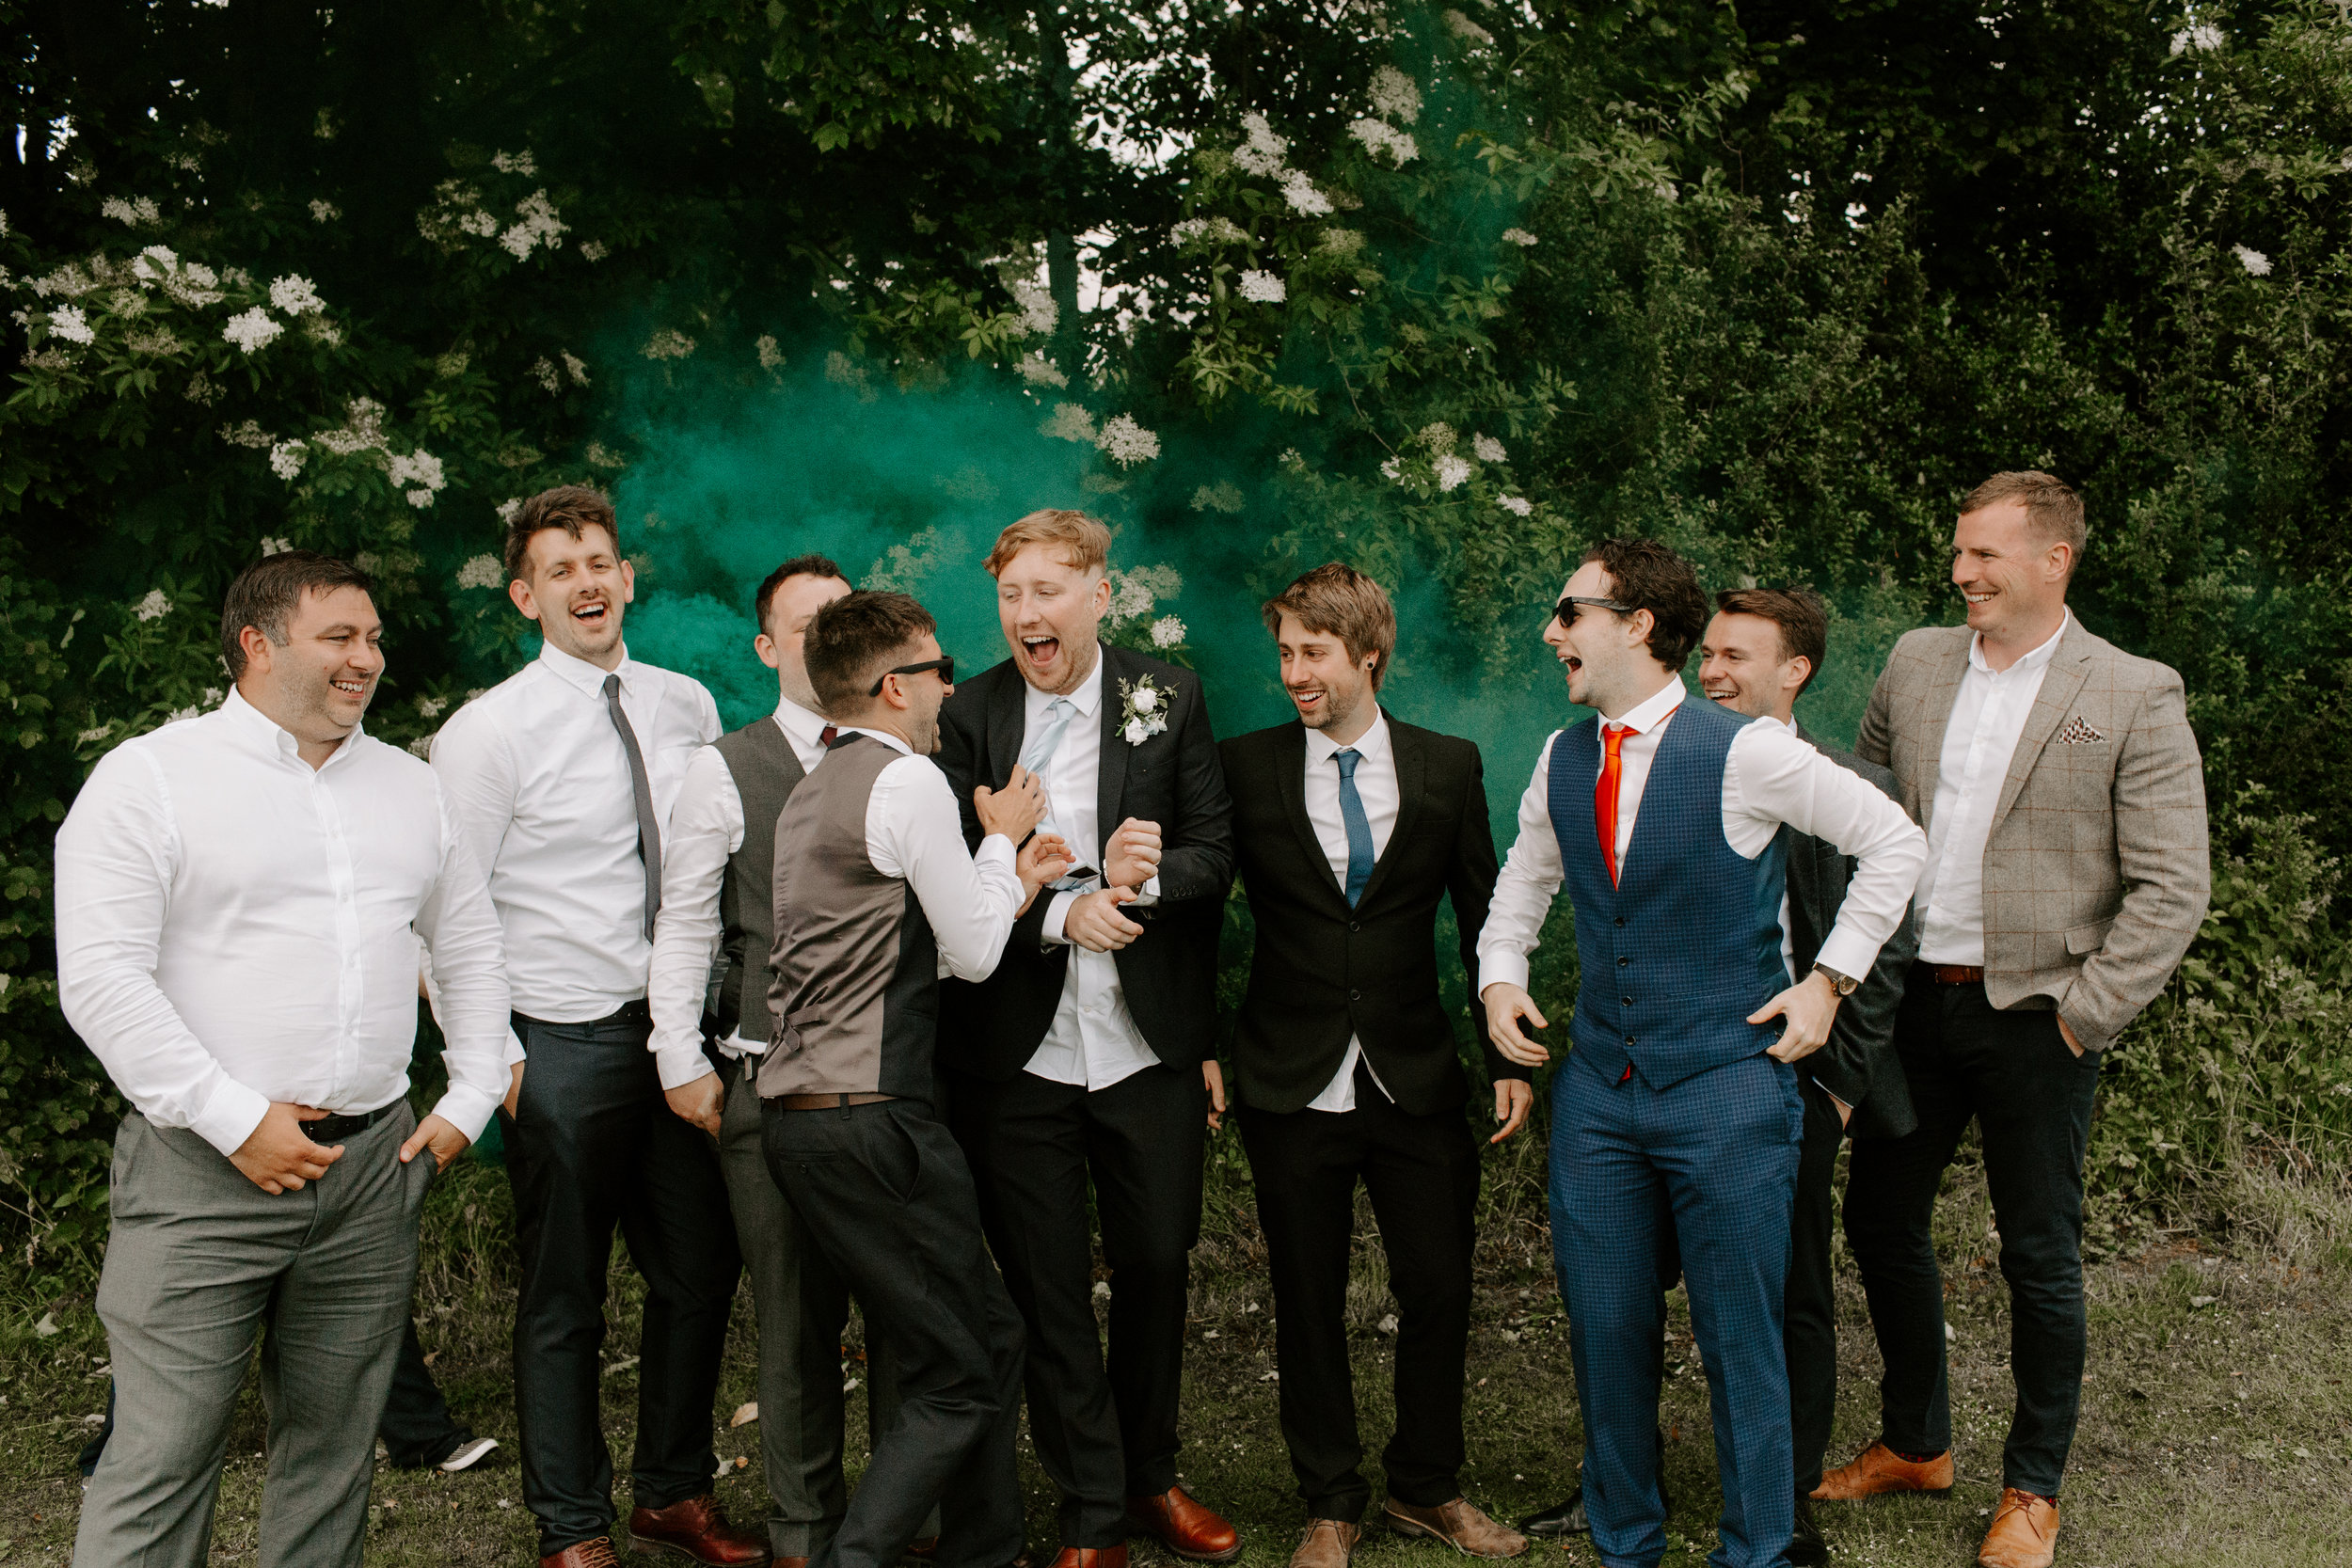 st-annes-wedding-photographer.jpg